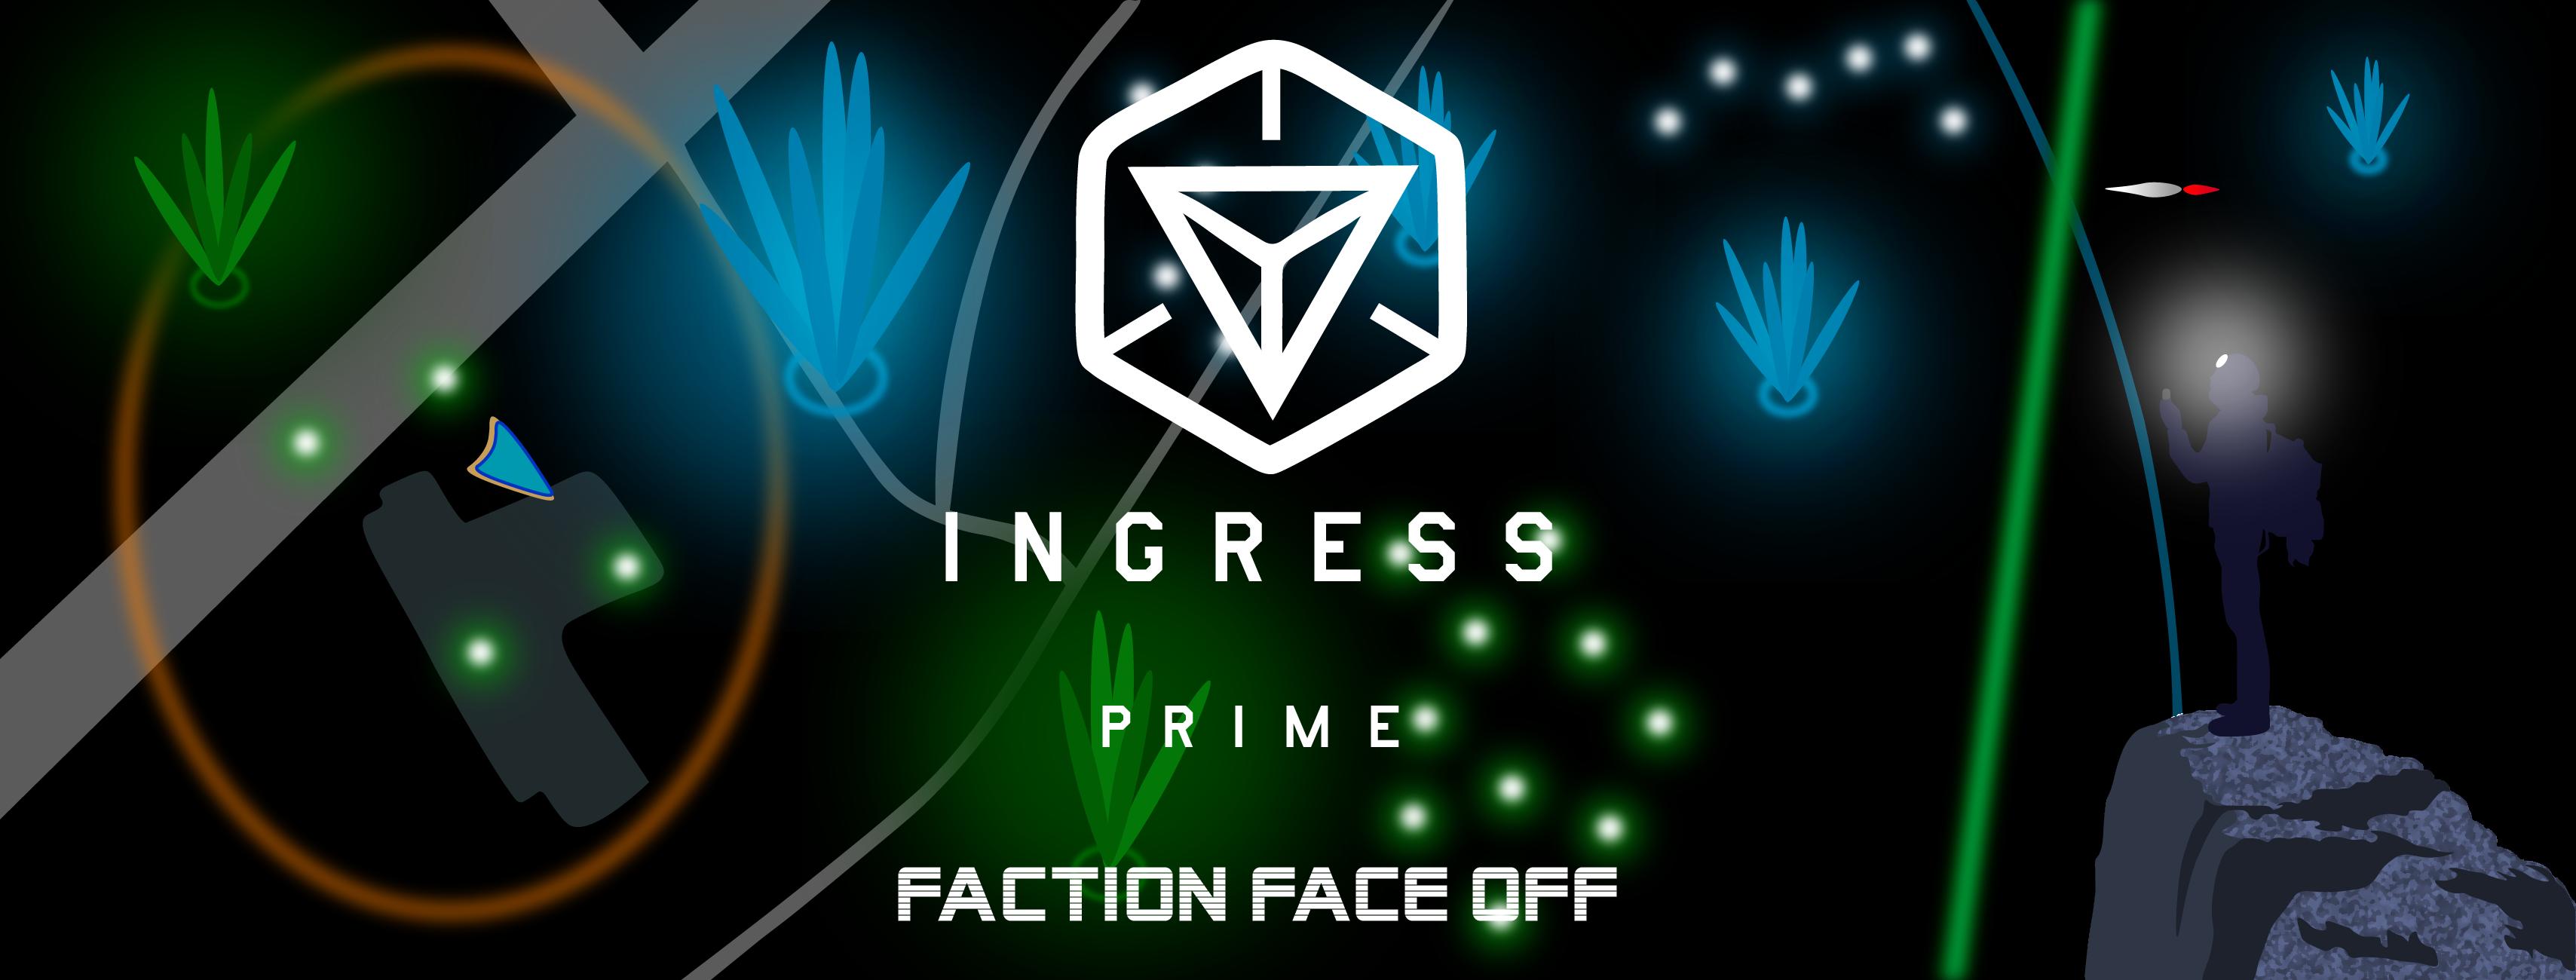 Ingress Prime Faction Face Off